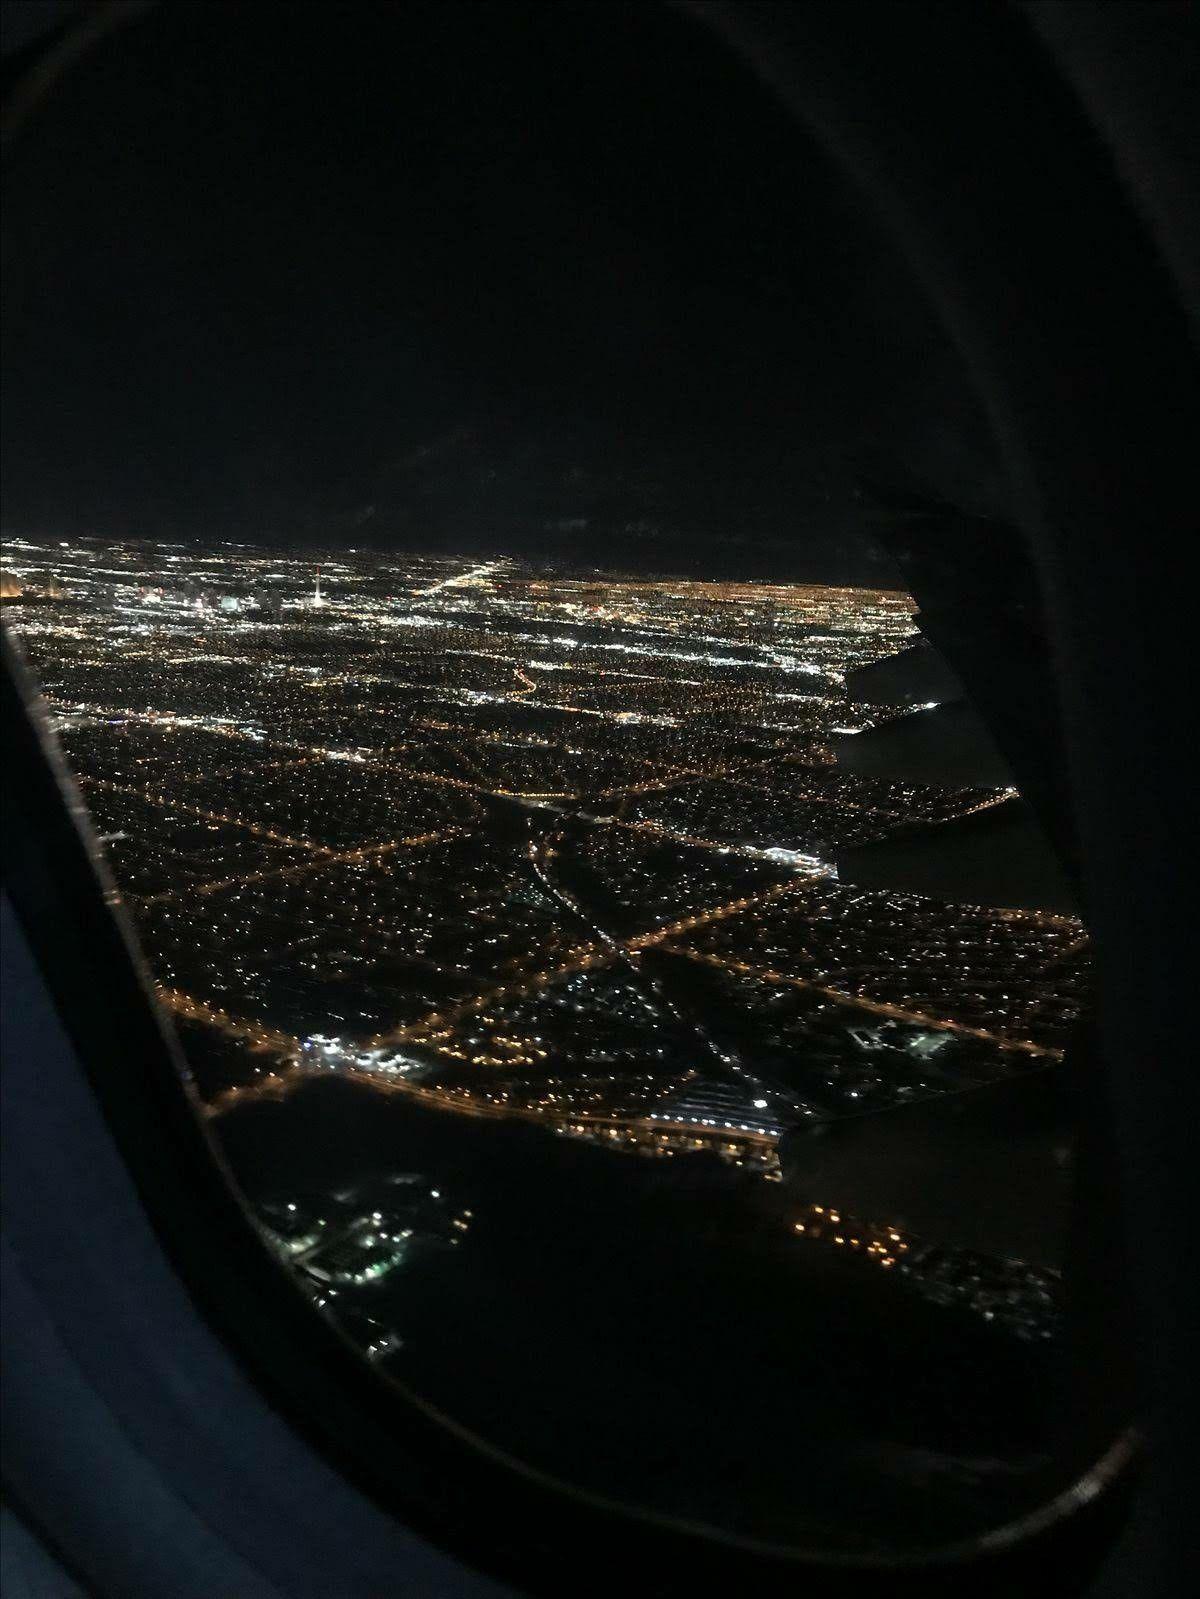 Airplane Airplane In 2020 Airplane Window Airplane Window View Plane Window